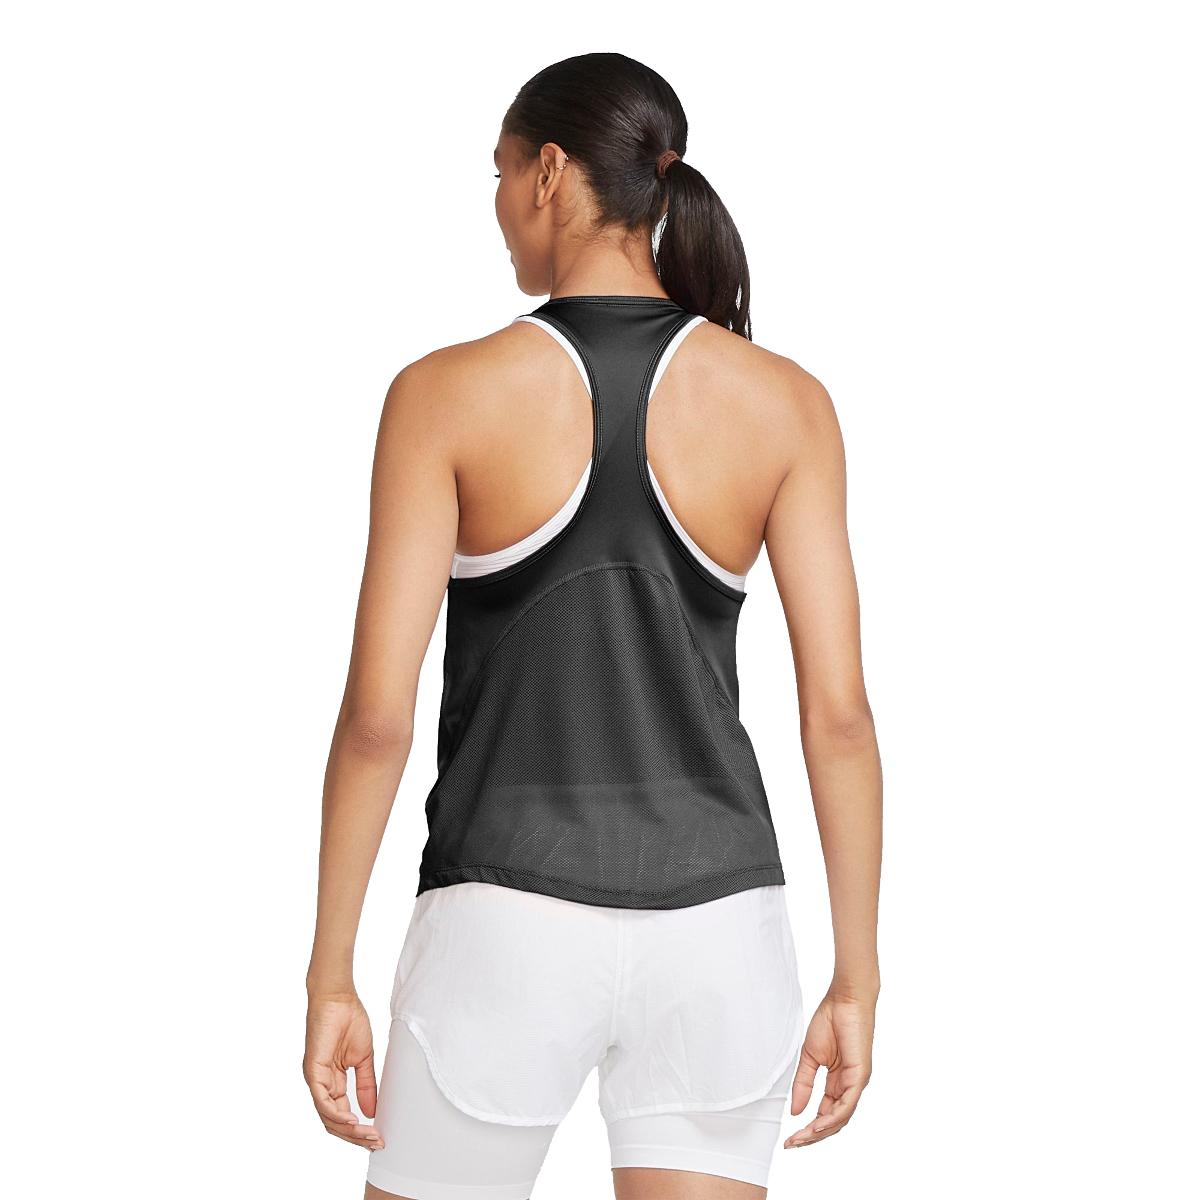 Women's Nike Miler Women's Running Singlet - Color: Black/Reflective - Size: S, Black/Reflective, large, image 3